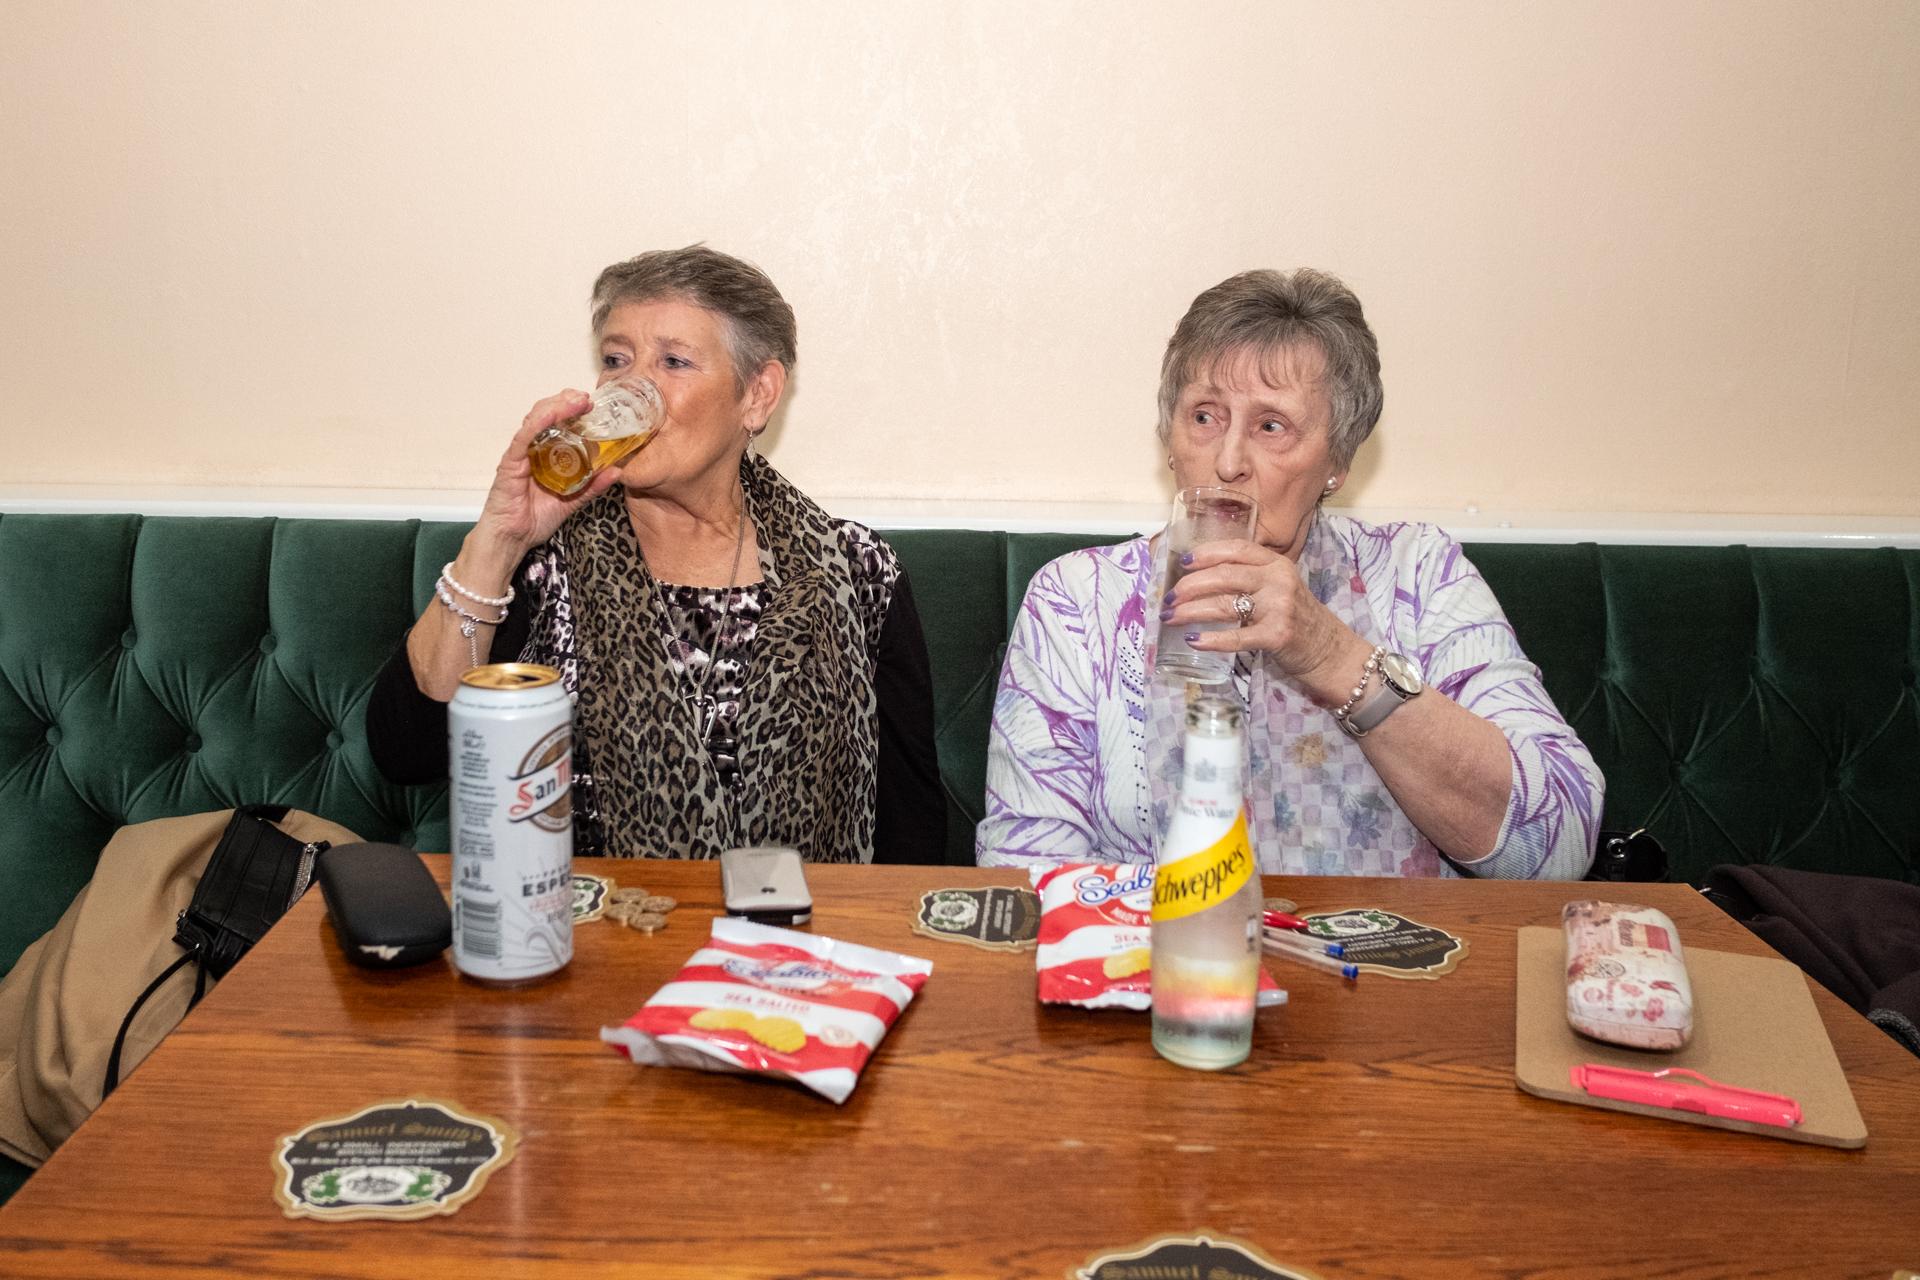 Ian Weldon Photography - Dunston Social Club Bingo-2.jpg